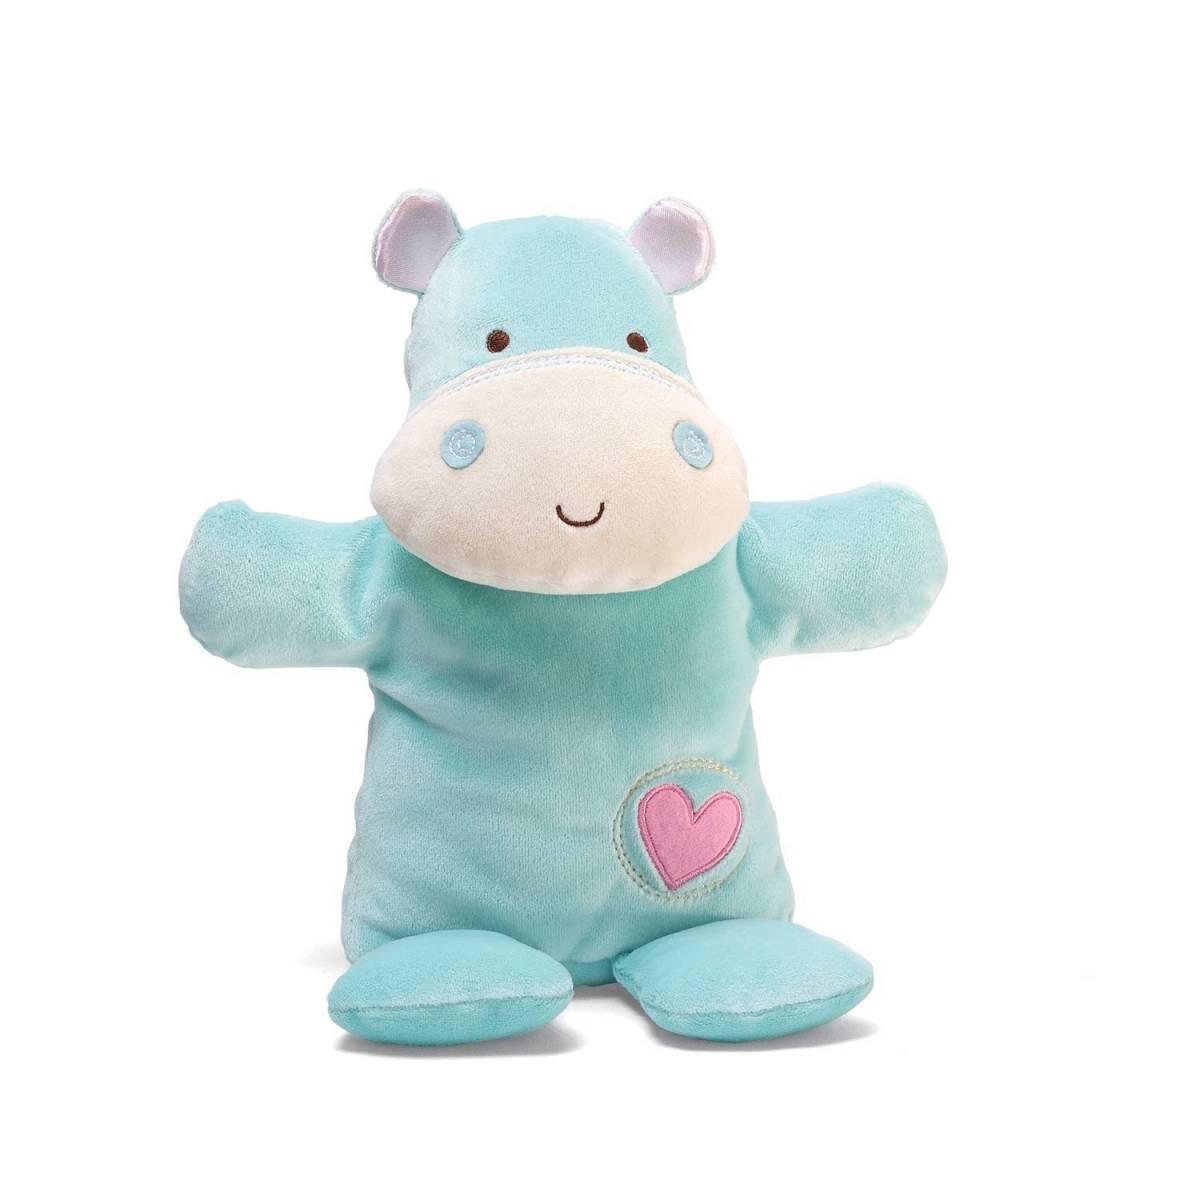 Baby Gund - Doudou Hippo - 30 cm